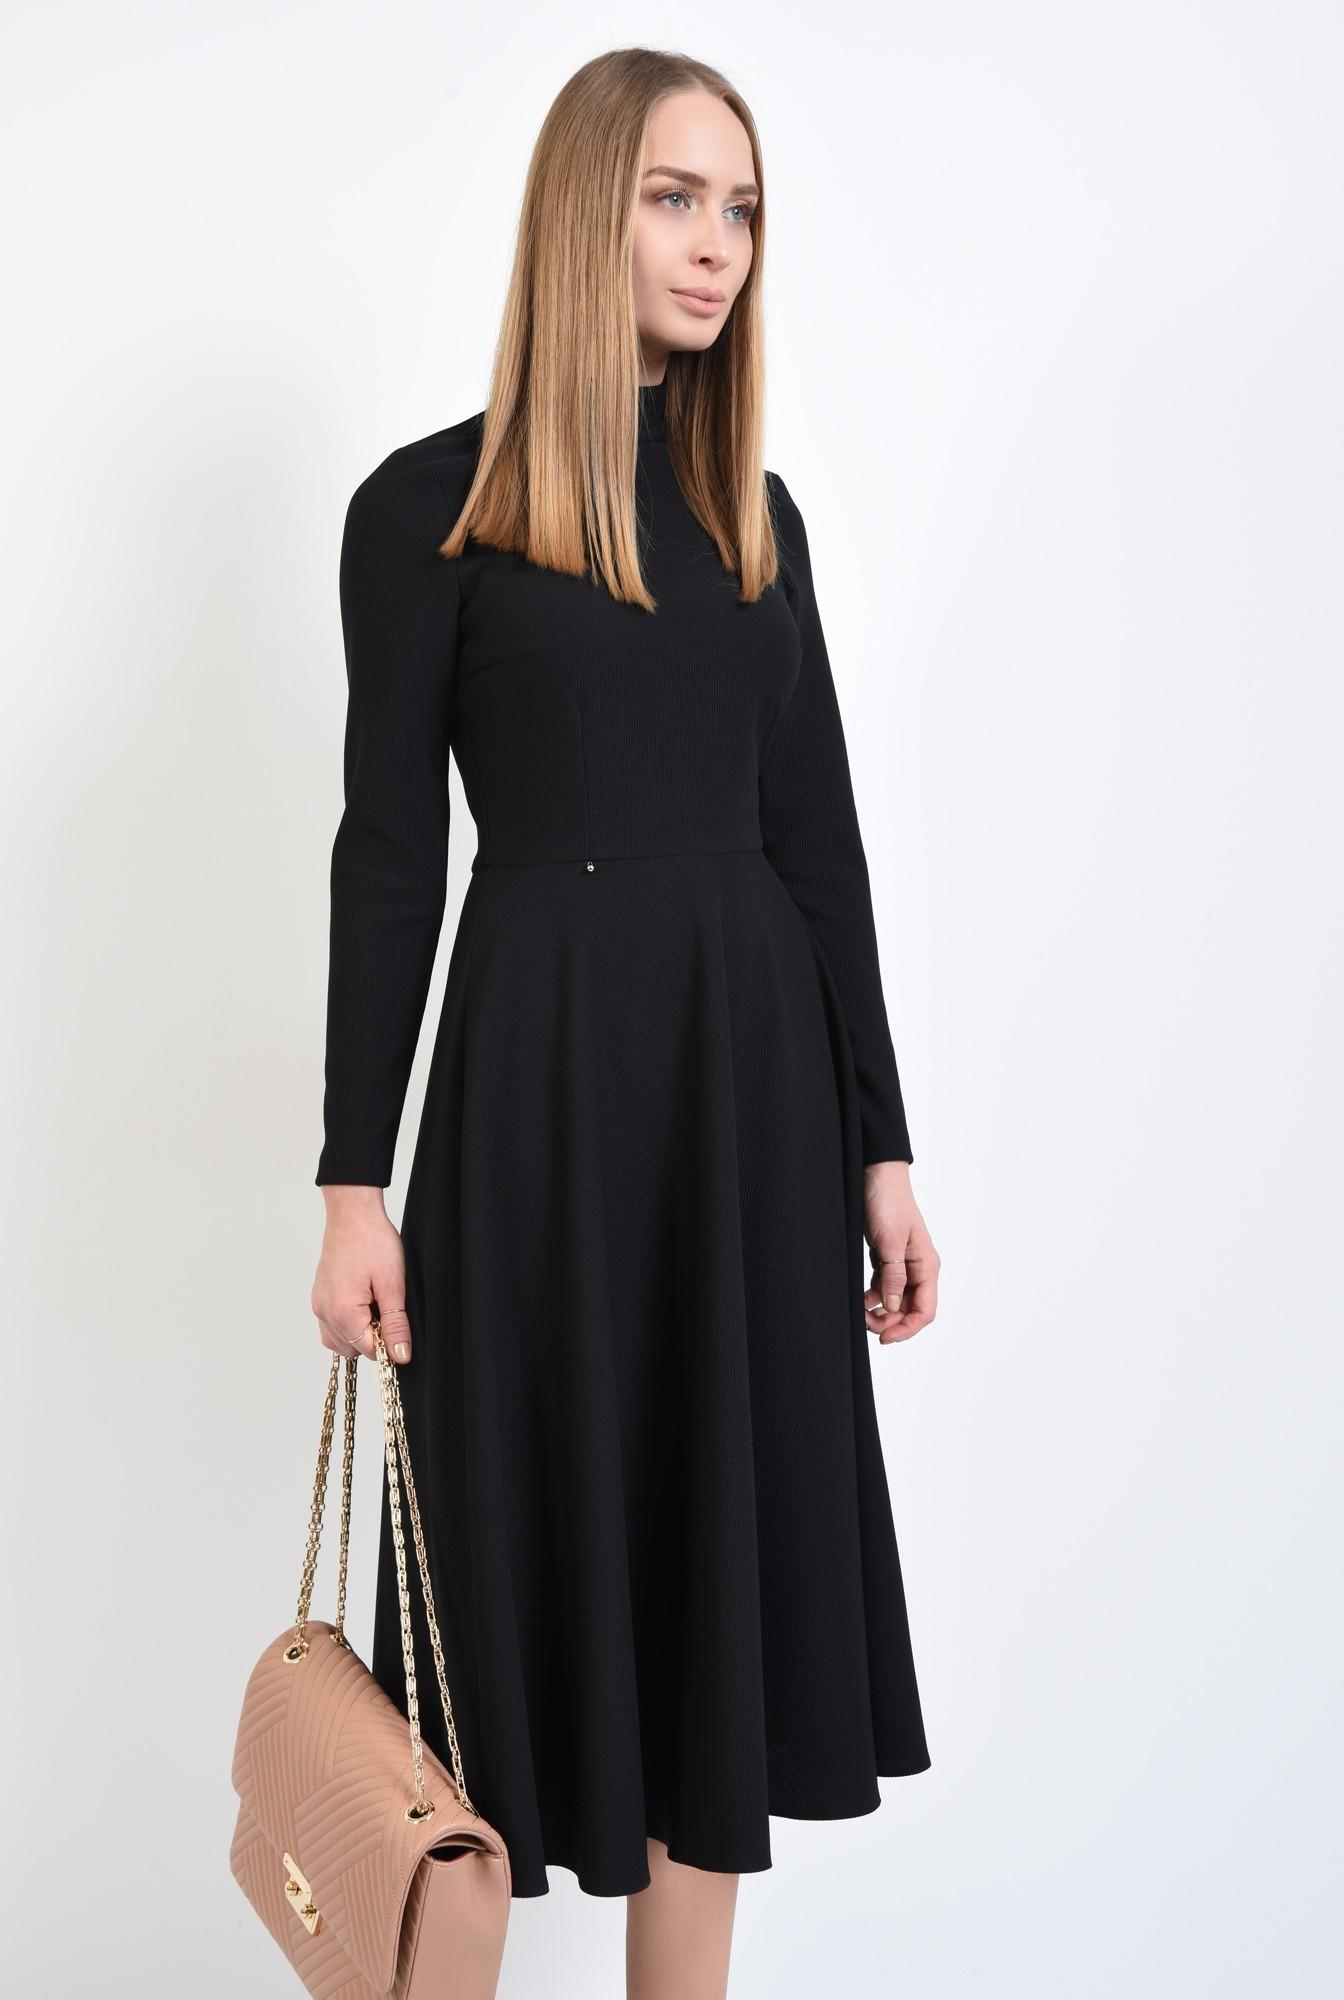 2 - rochie casual, neagra, evazata, nasturi la spate, guler inalt